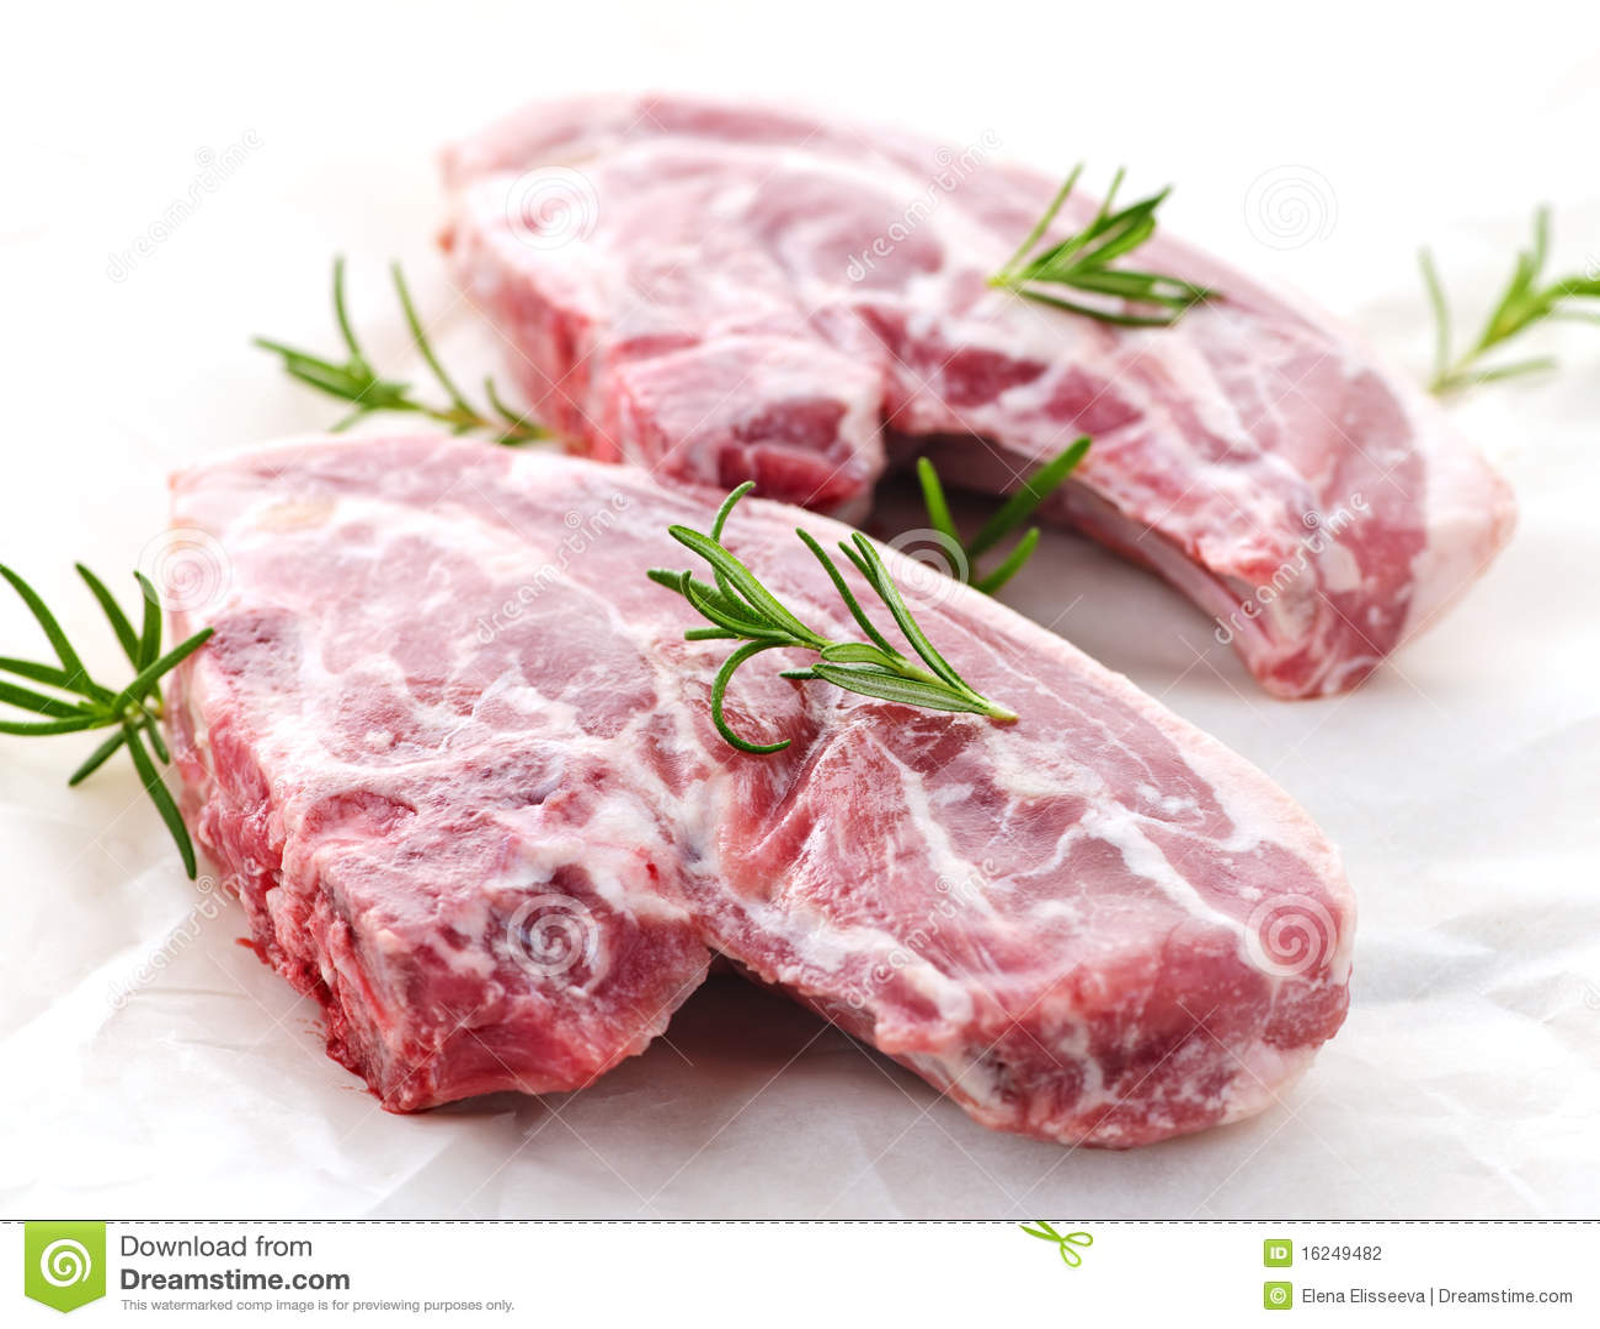 Raw lamb chops stock photo. Image of cuts, freshness - 16249482 for Raw Lamb Chop  lp5fsj